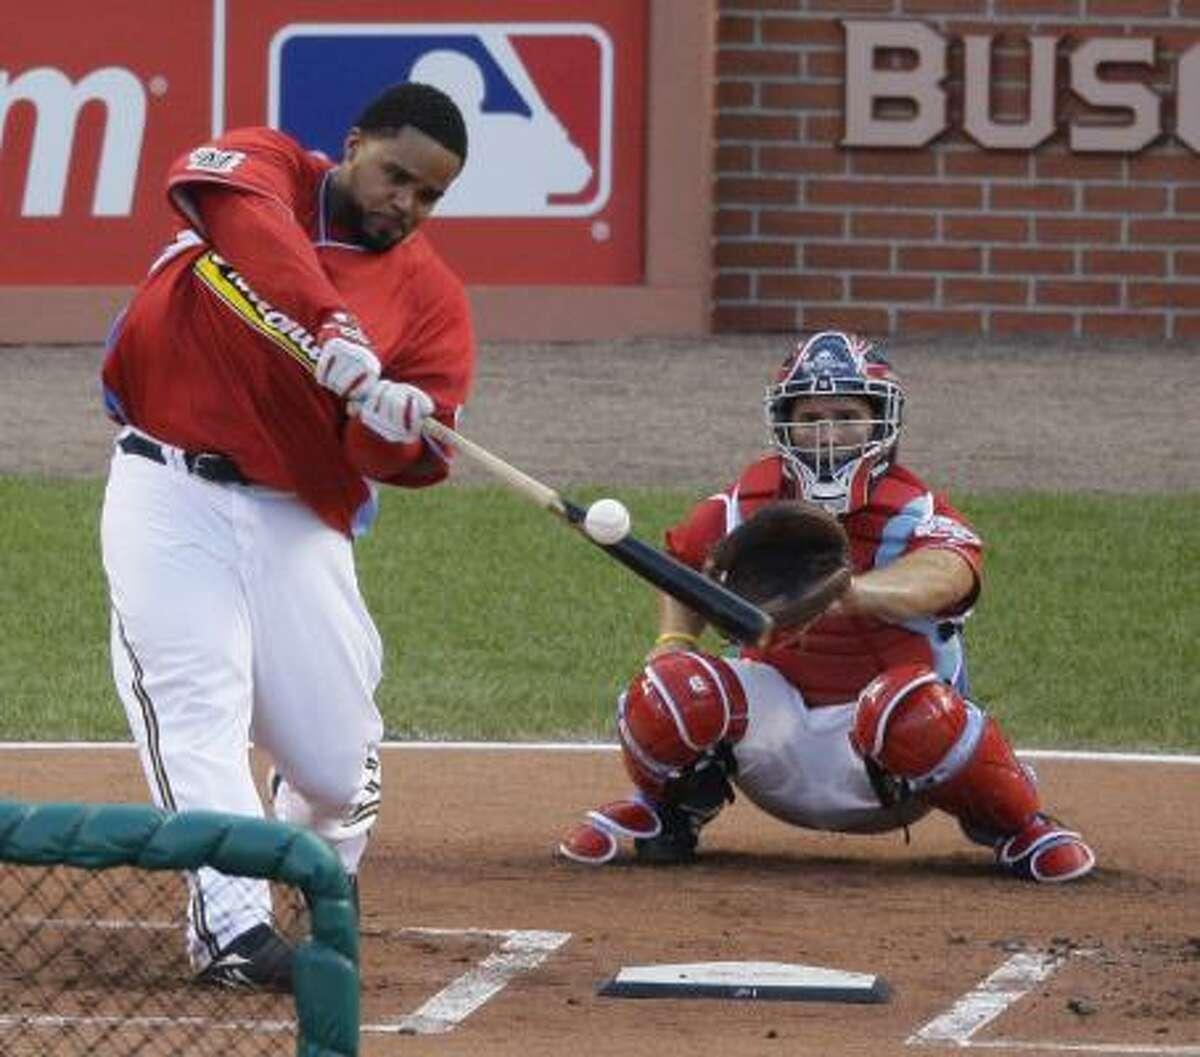 Brewers first baseman Prince Fielder: 11 HR